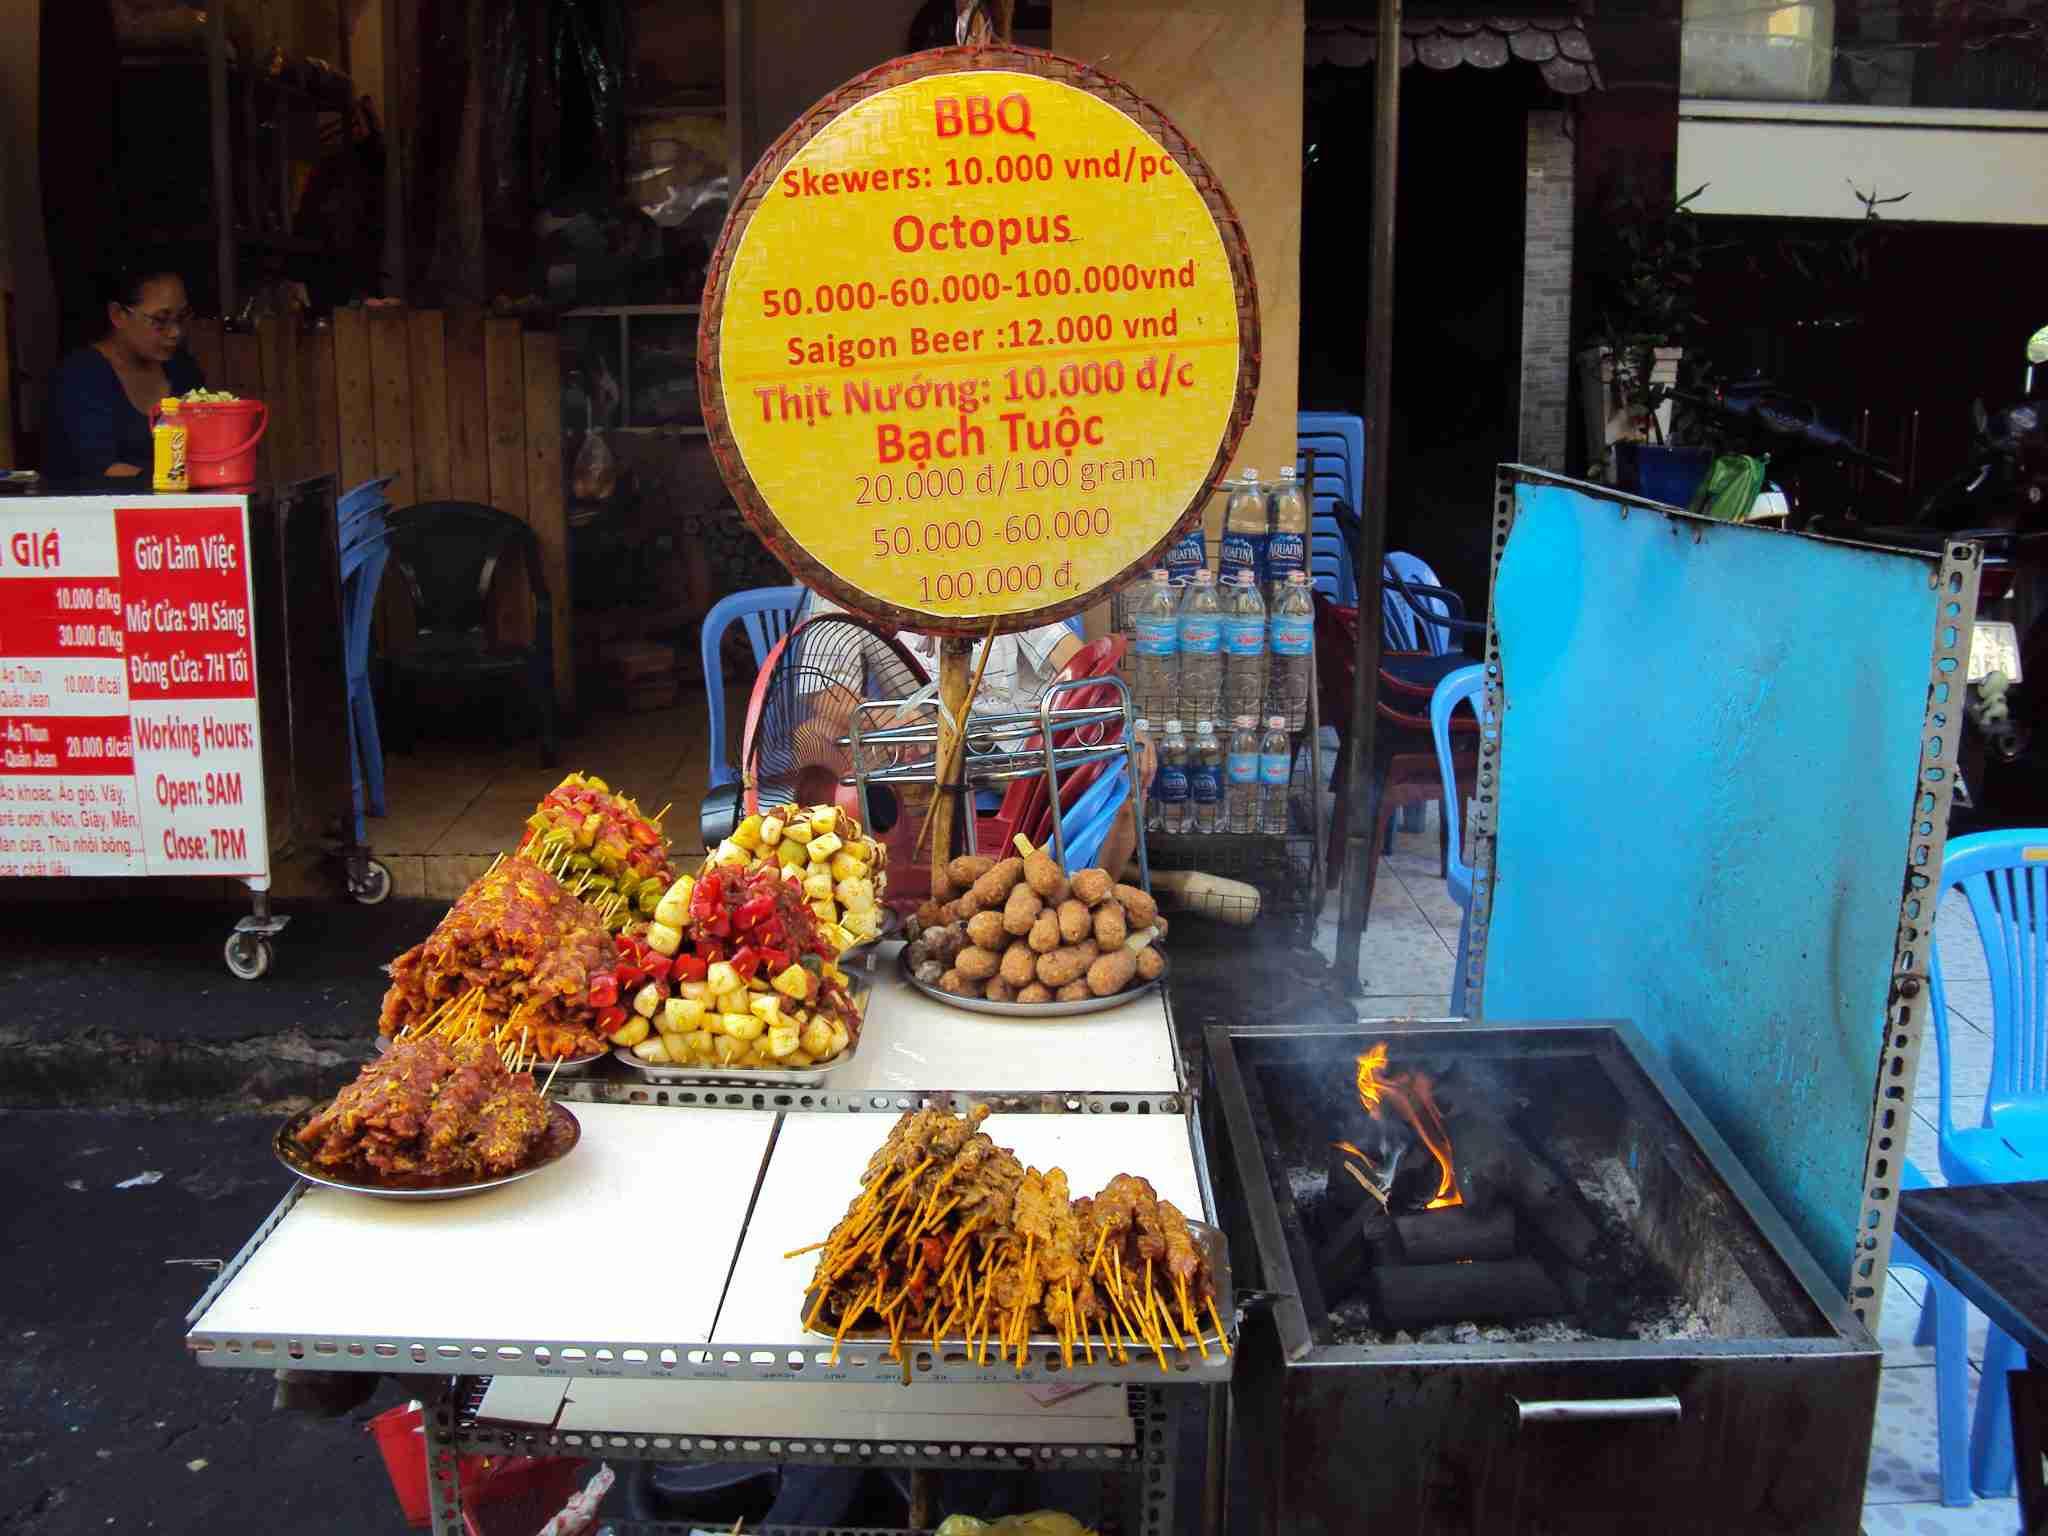 Saigon - looks inviting